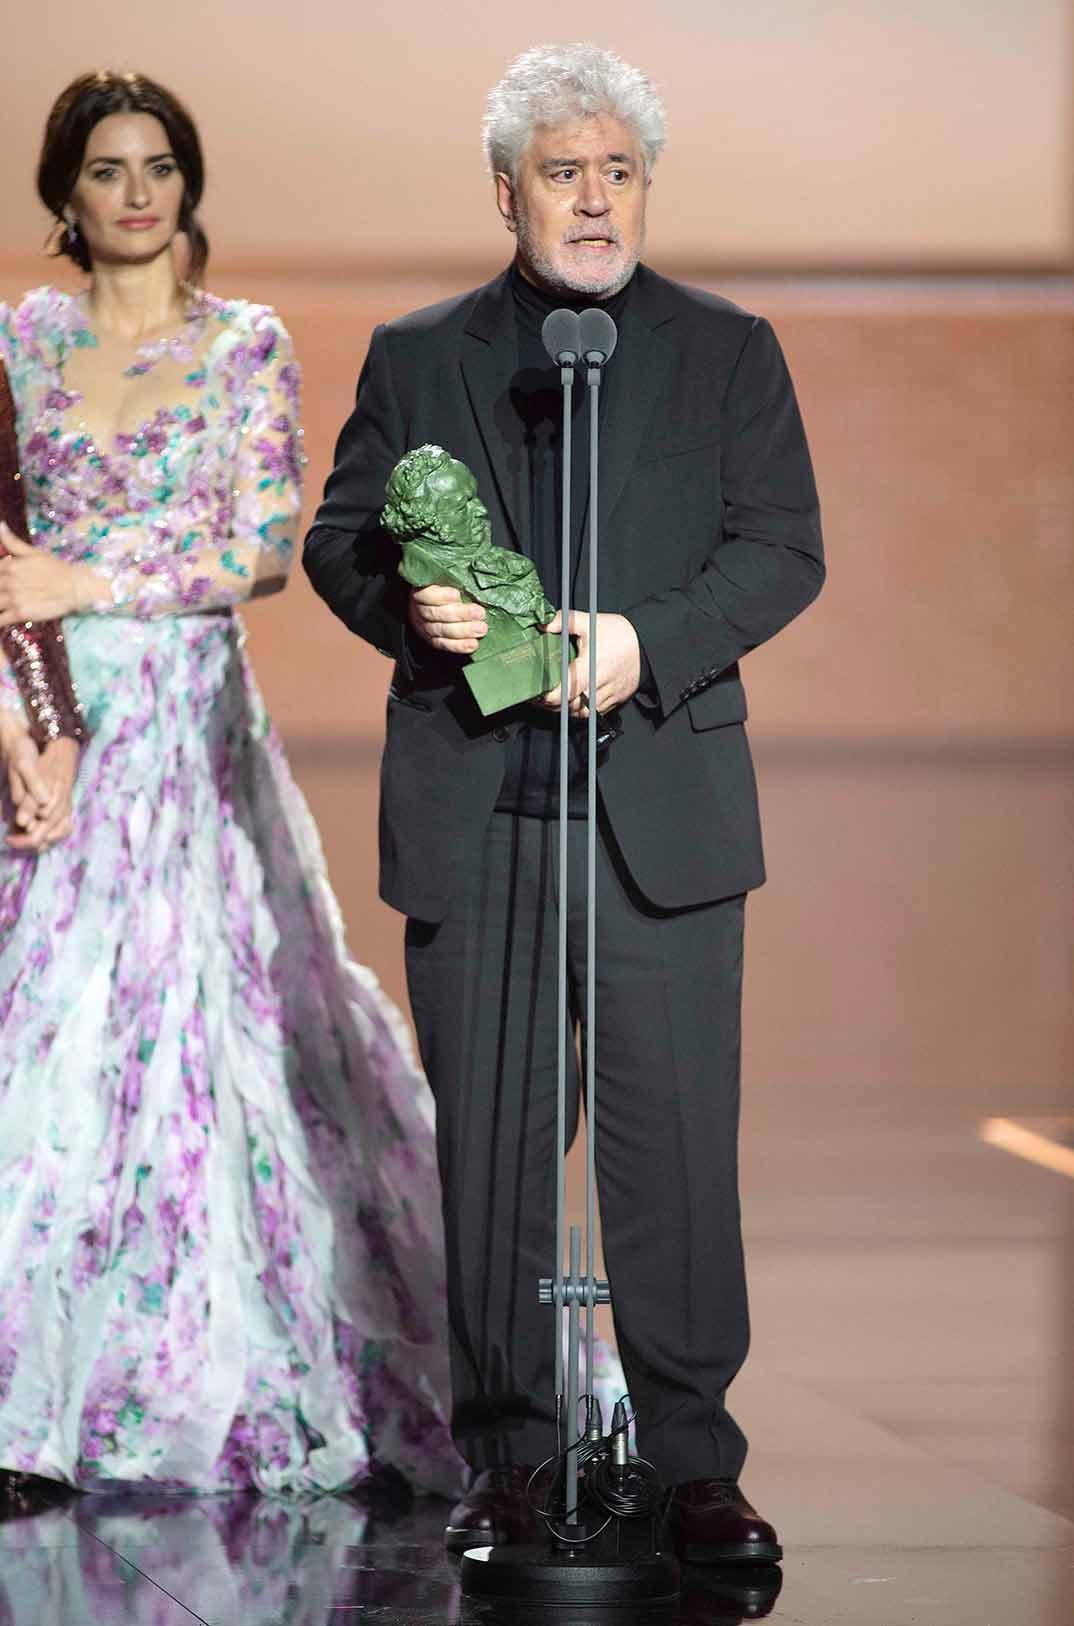 Pedro Almodóvar - Premios Goya 2020